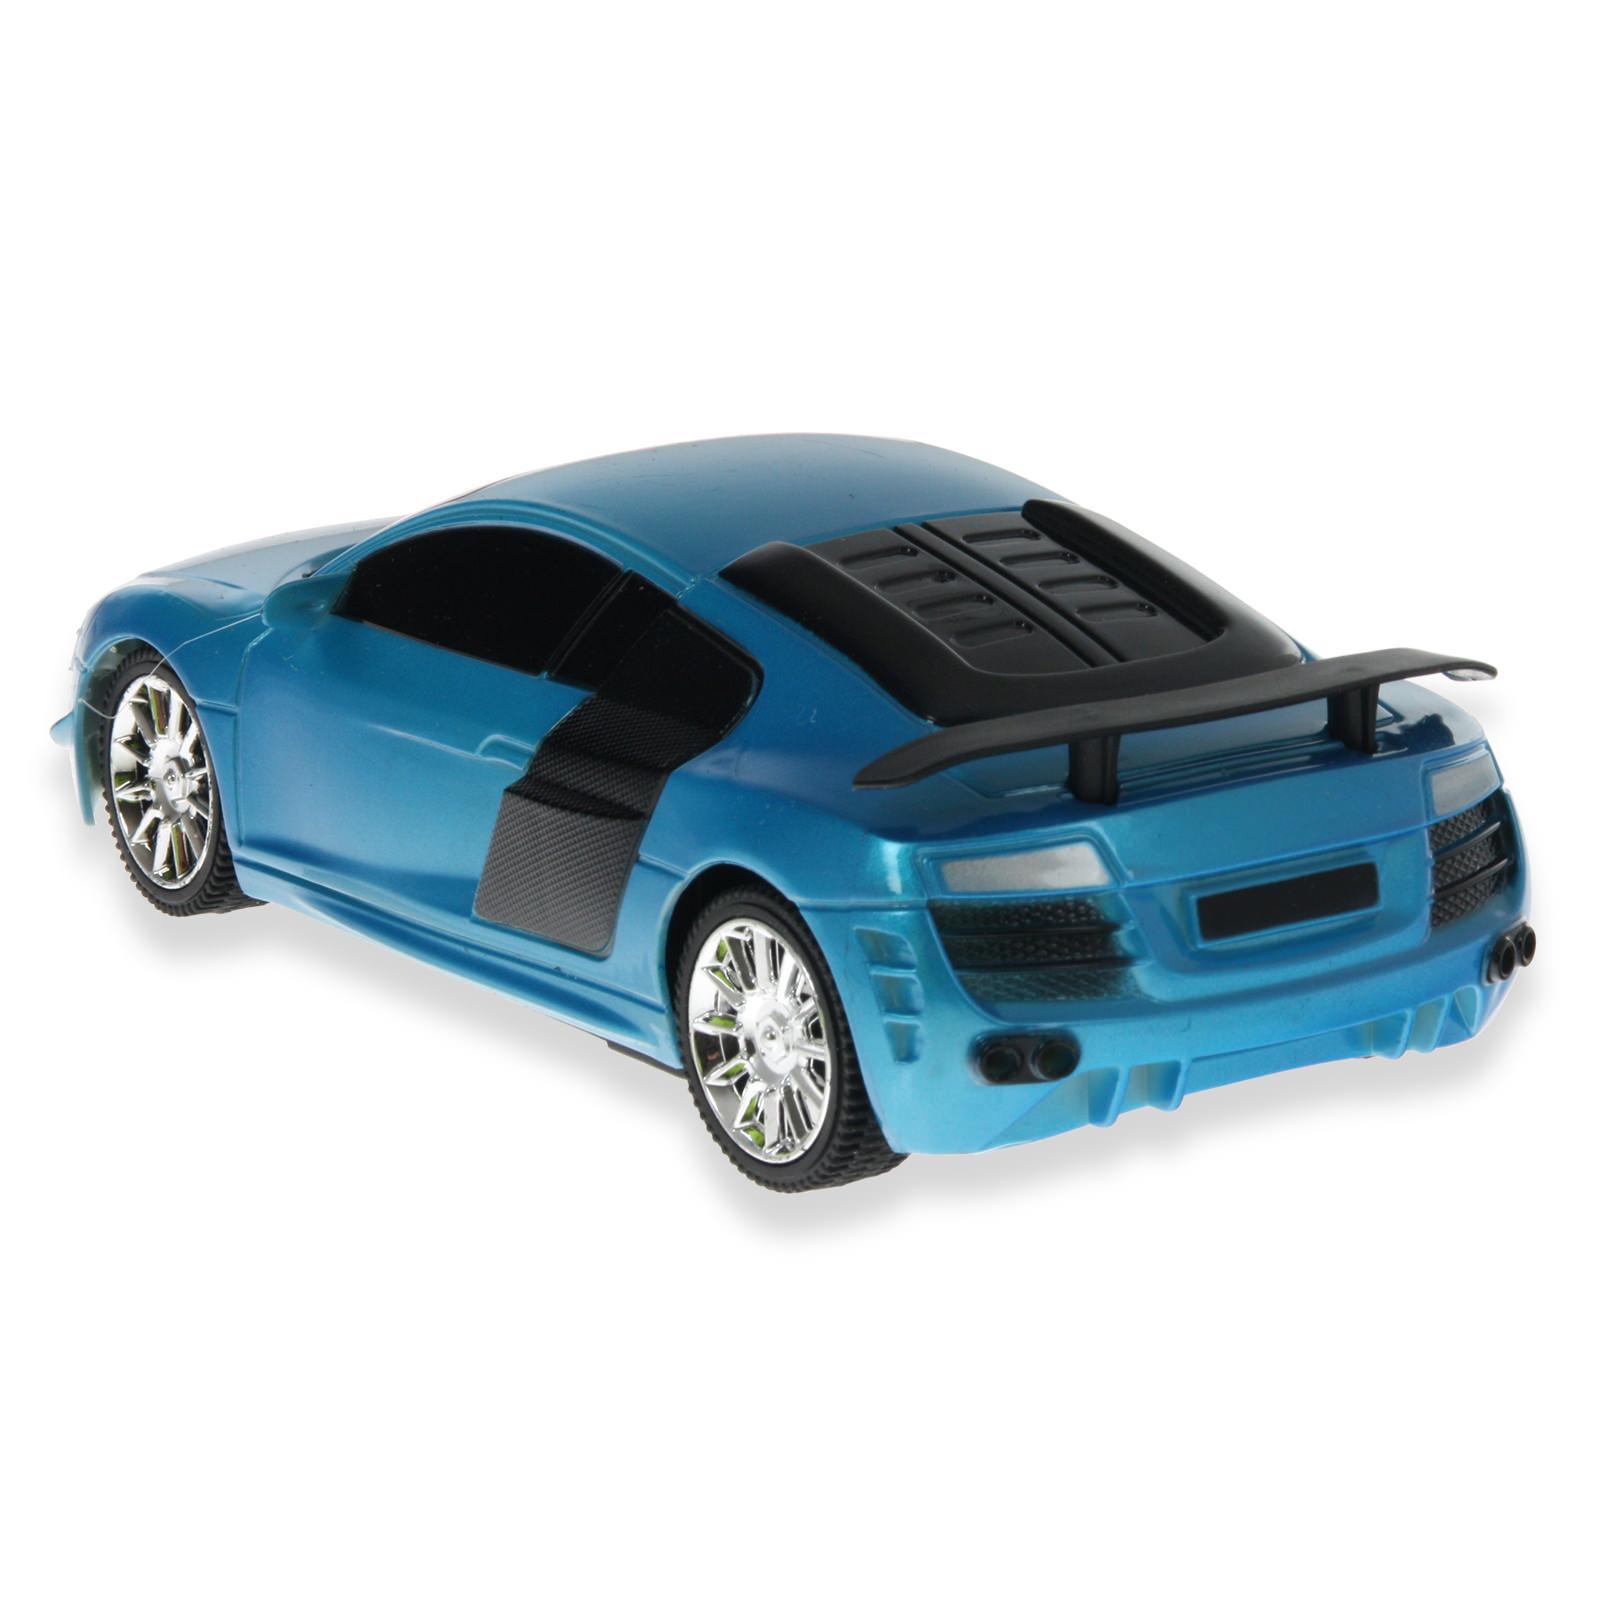 Fast Car LF10 Blue Audi R8 RC Car At Hobby Warehouse